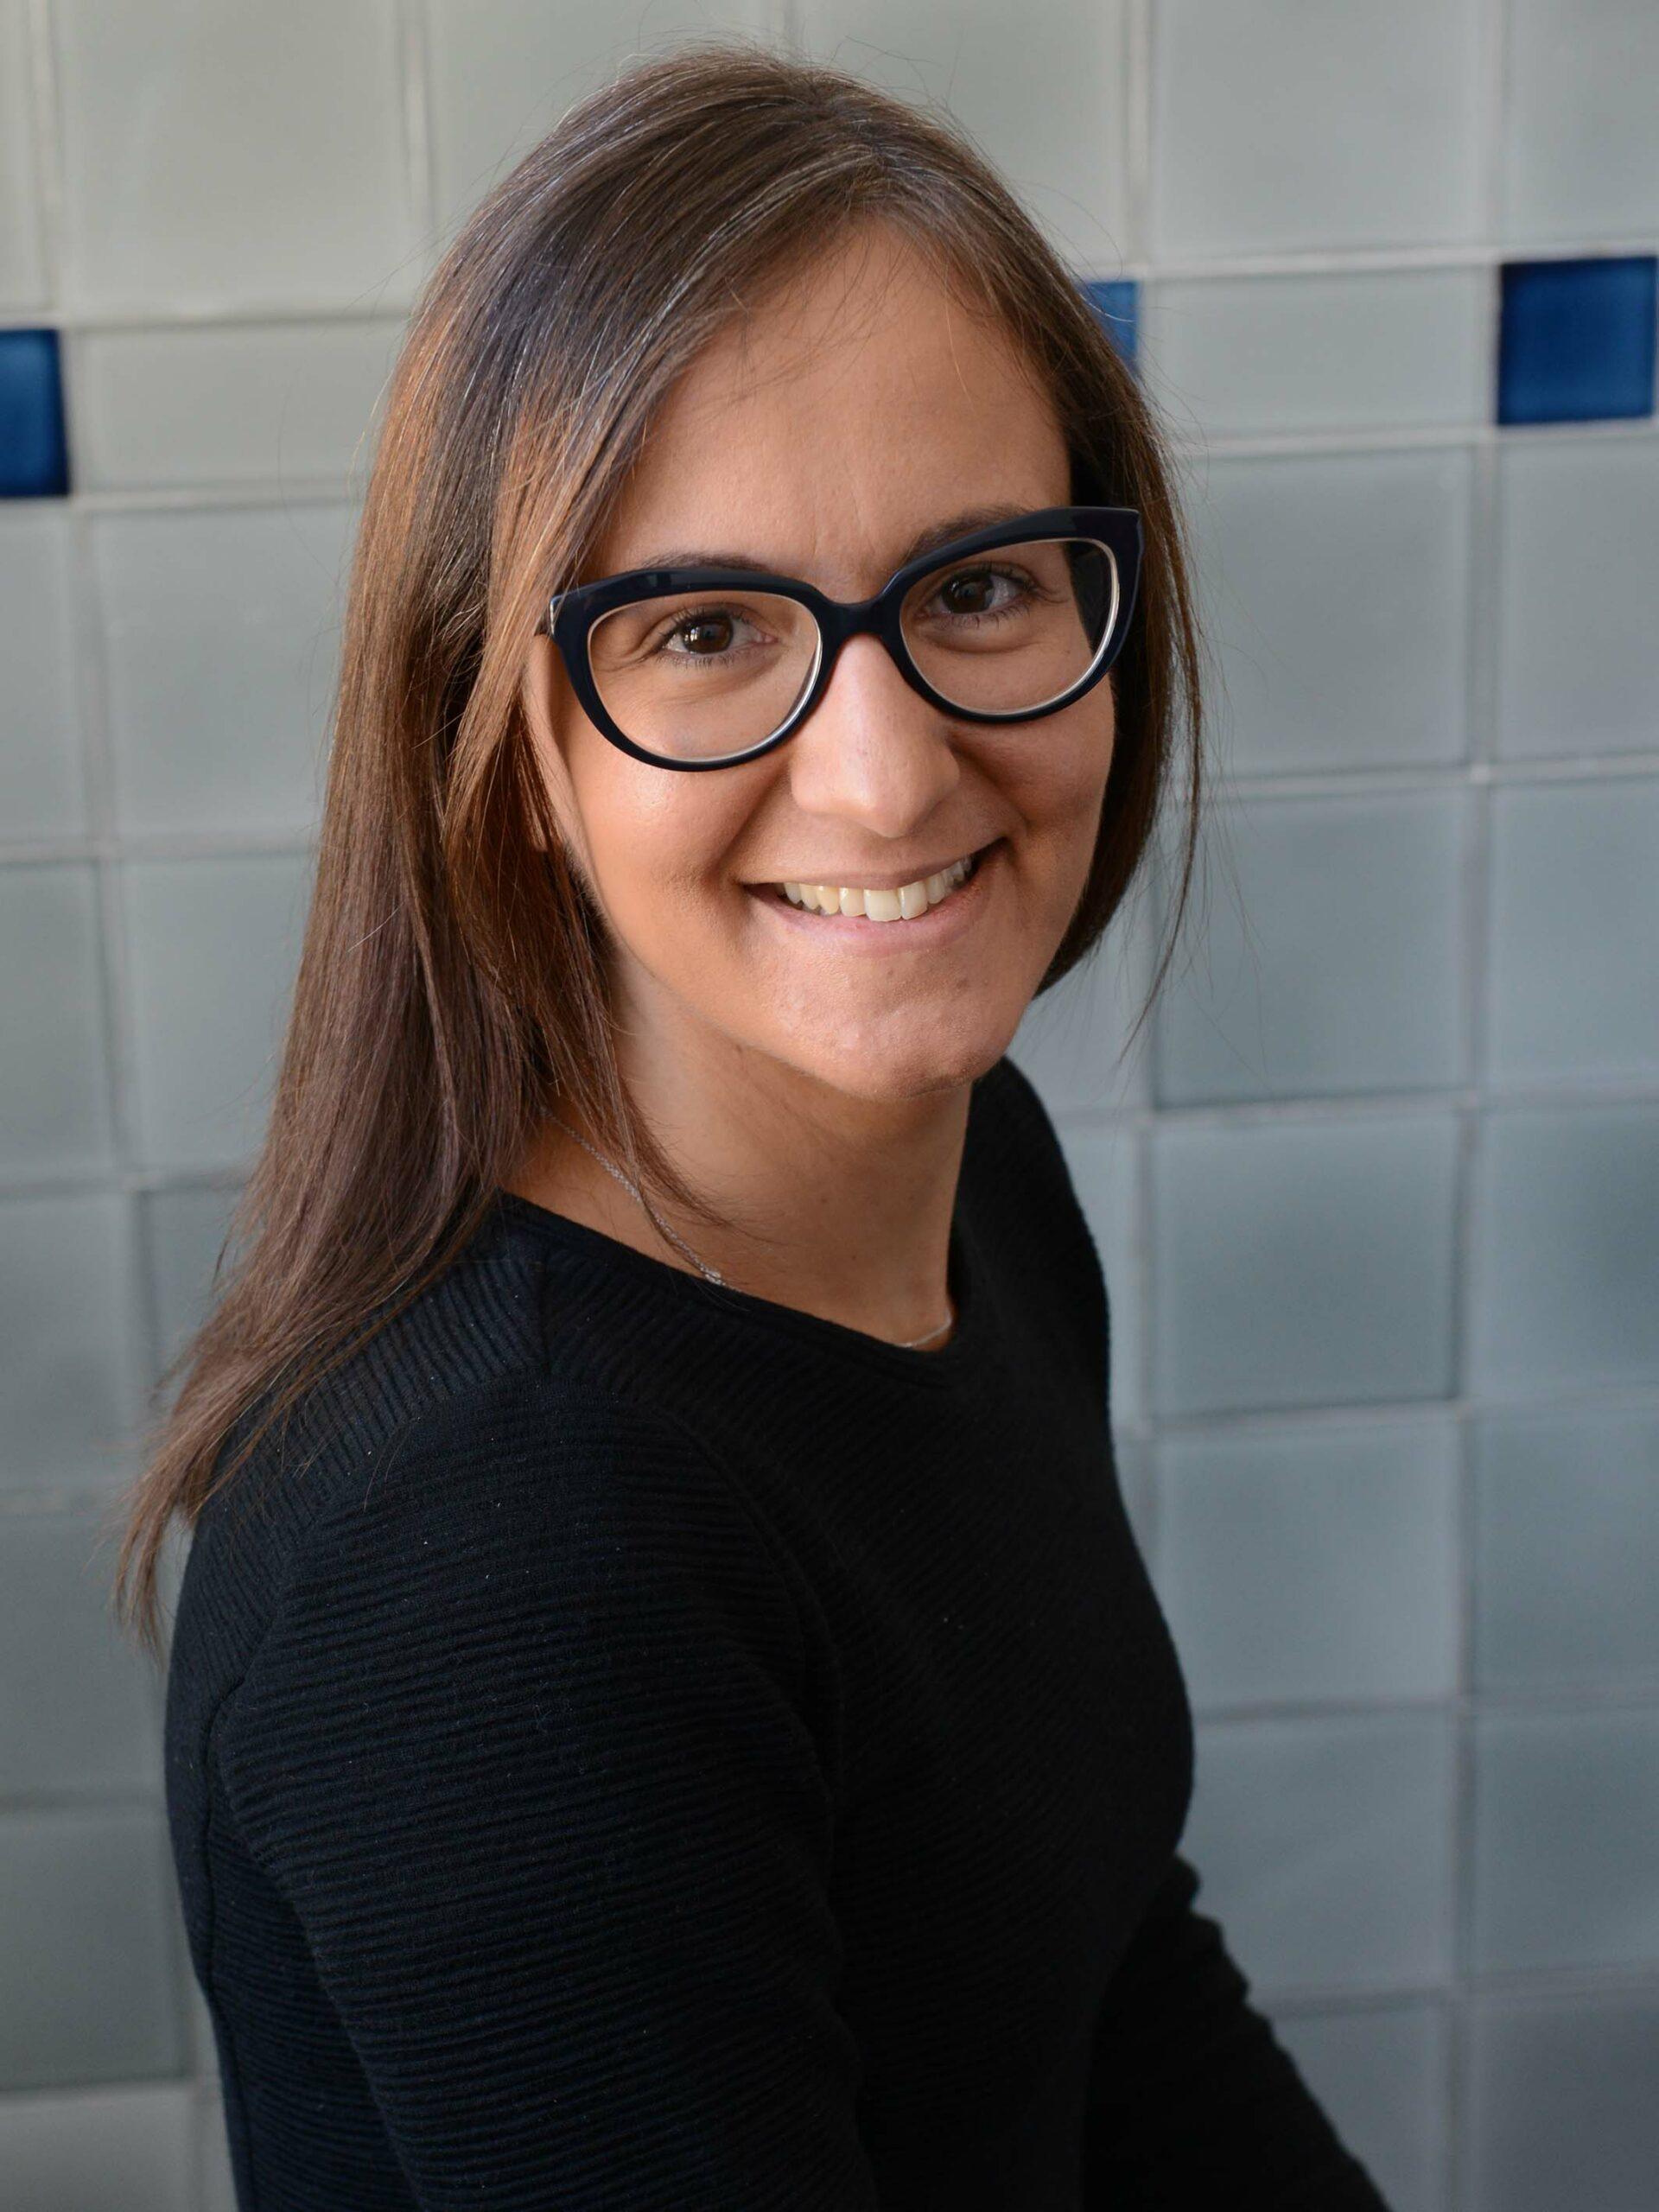 Ass. Prof.in Dr.in Valeria Bordone